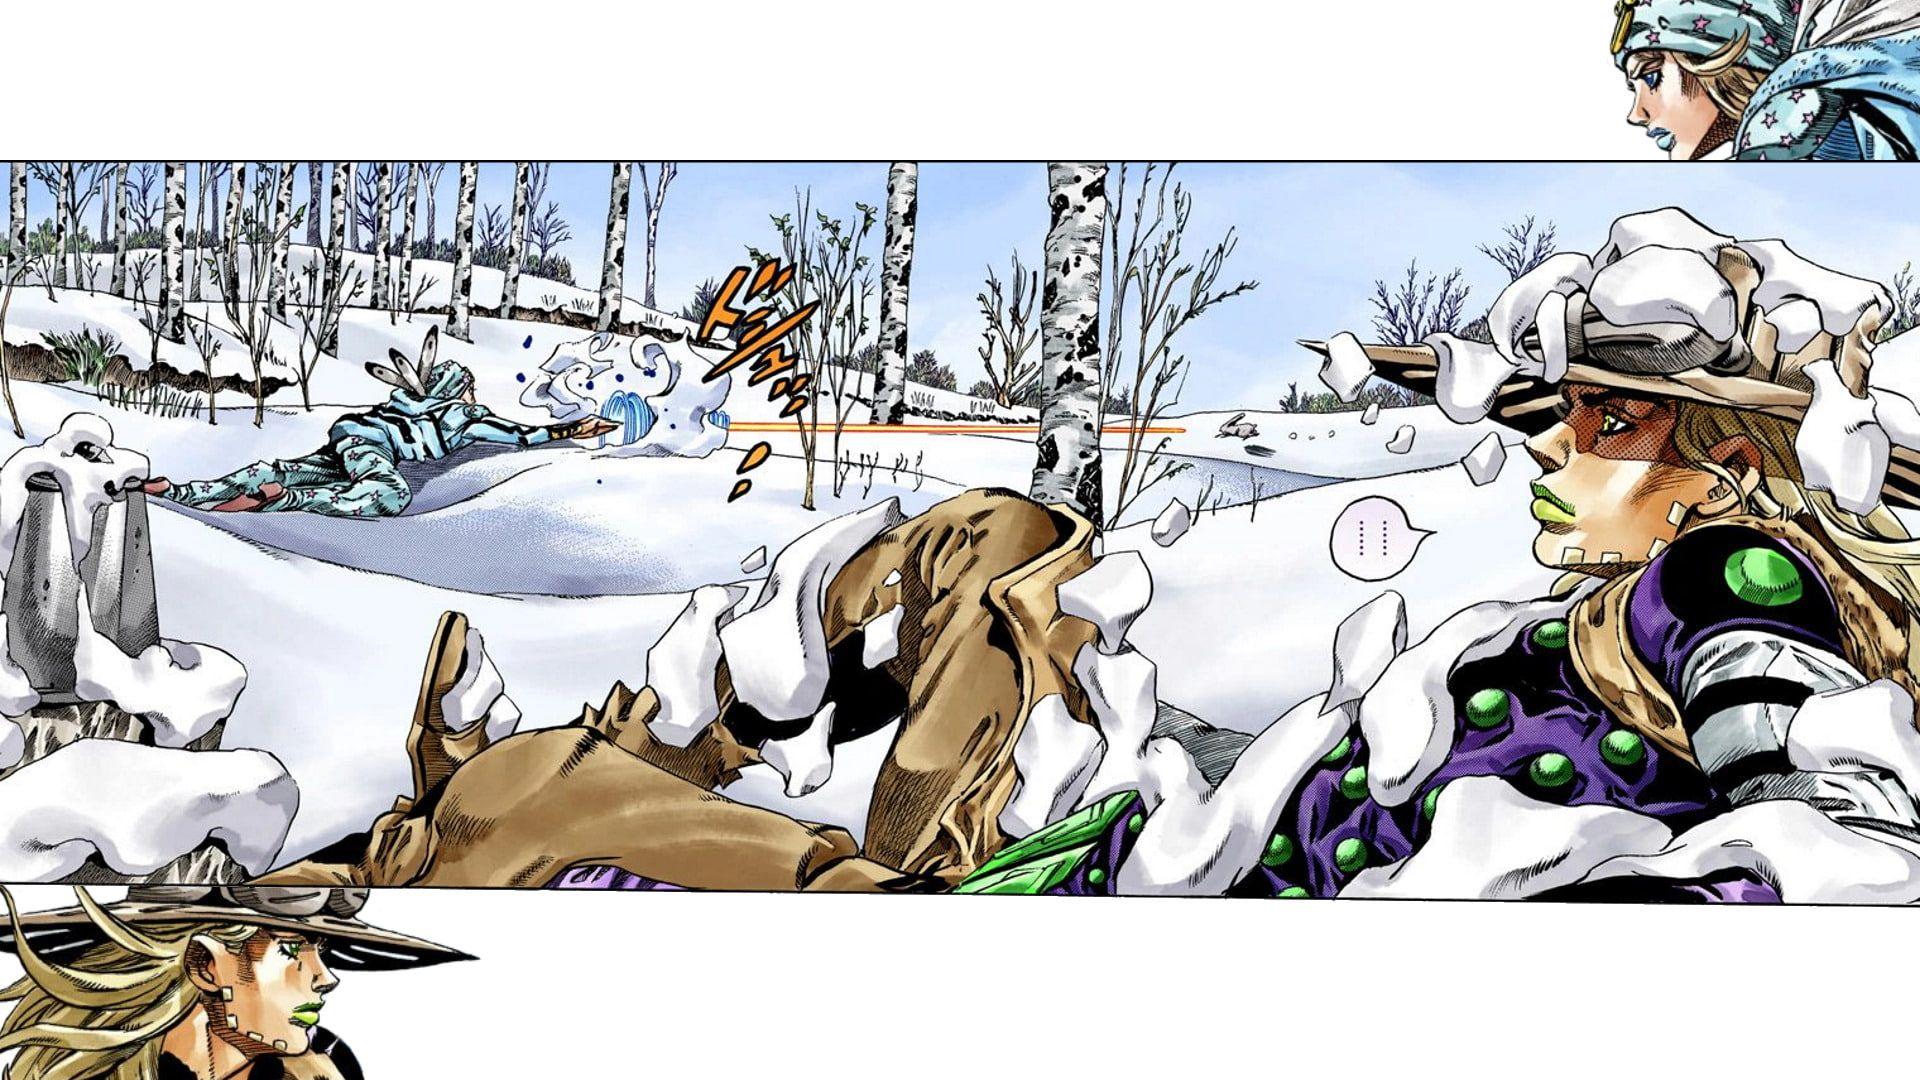 Anime Jojo S Bizarre Adventure Gyro Zeppeli Johnny Joestar 1080p Wallpaper Hdwallpaper Deskto Jojo S Bizarre Adventure Jojo Bizzare Adventure Jojo Bizarre